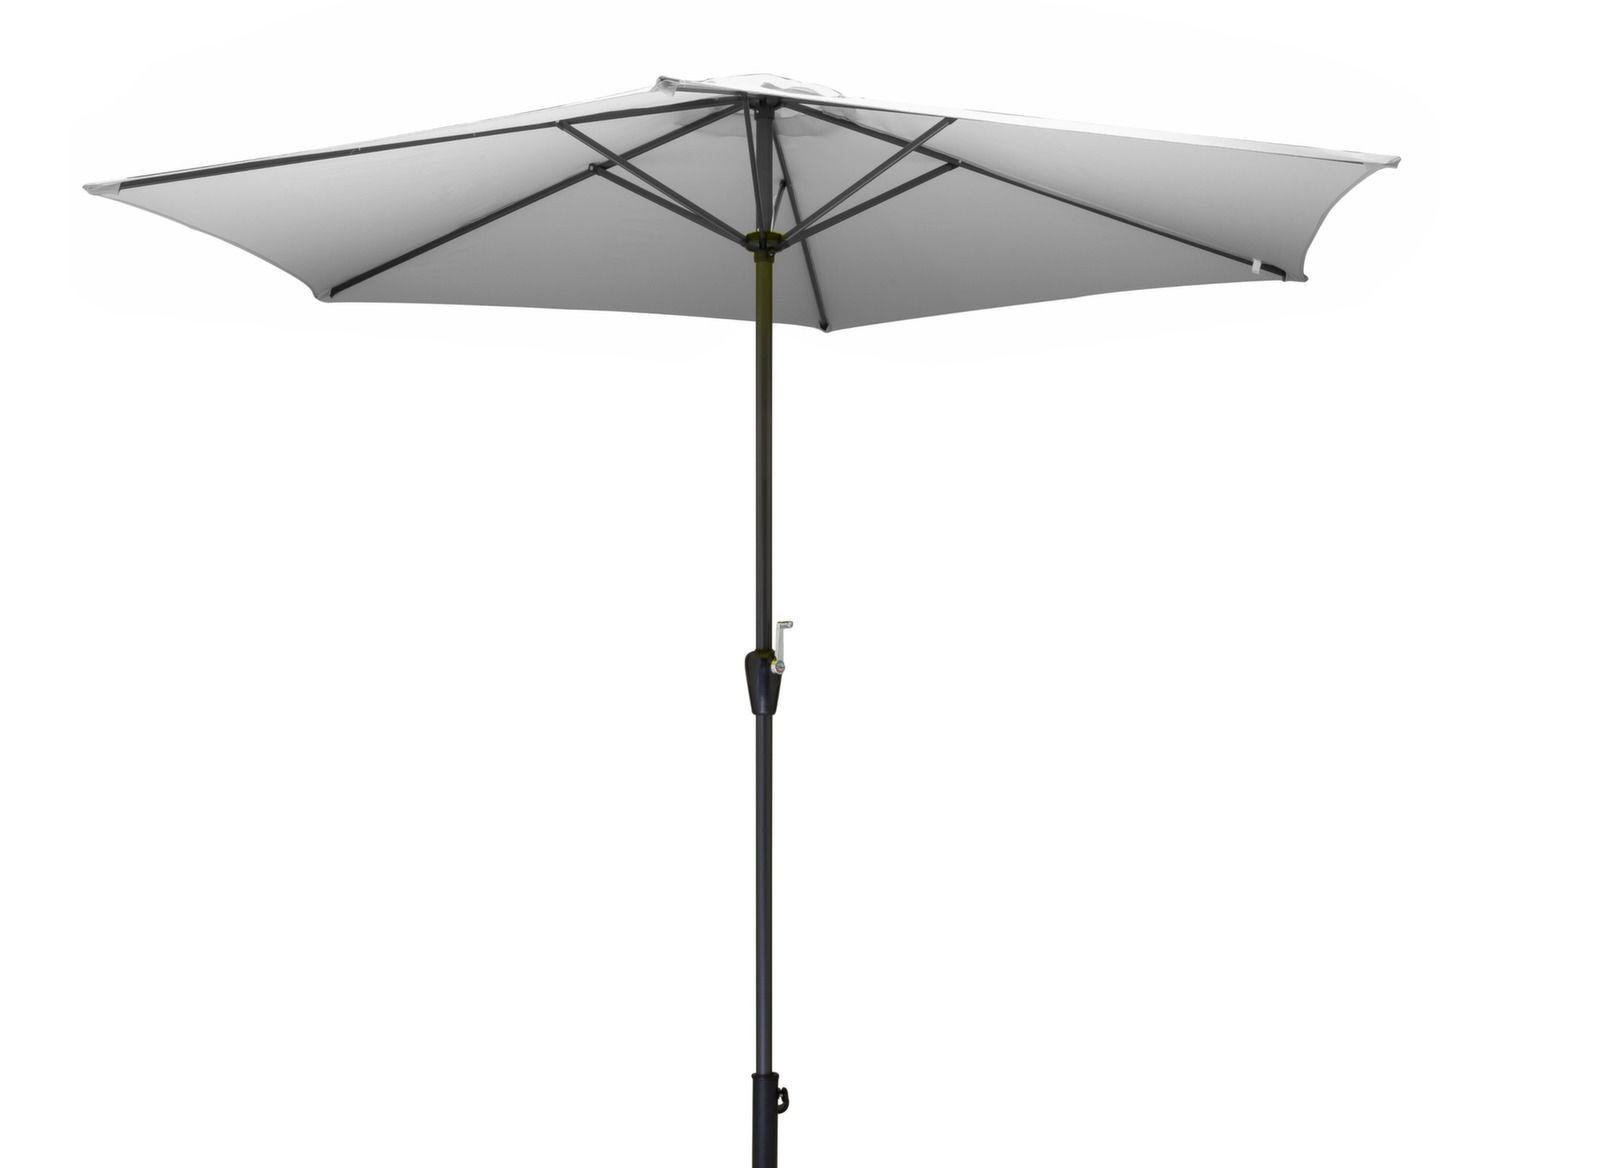 Parasol deport simple th and th century parasol fashions - Parasol deporte jardiland ...